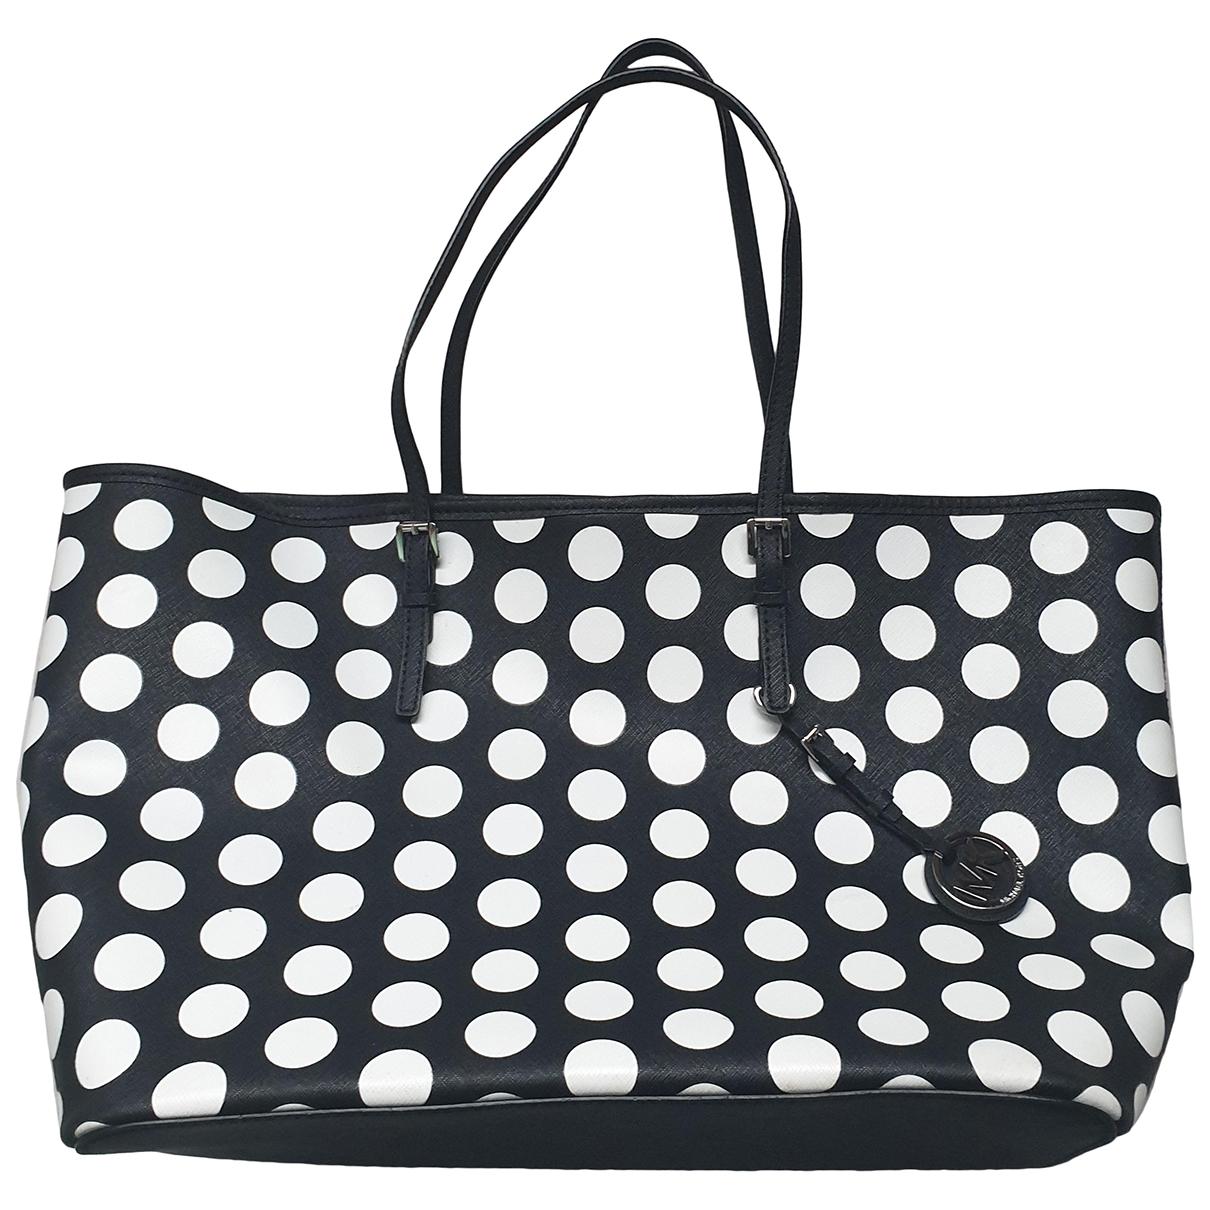 Michael Kors Jet Set Black Patent leather handbag for Women \N